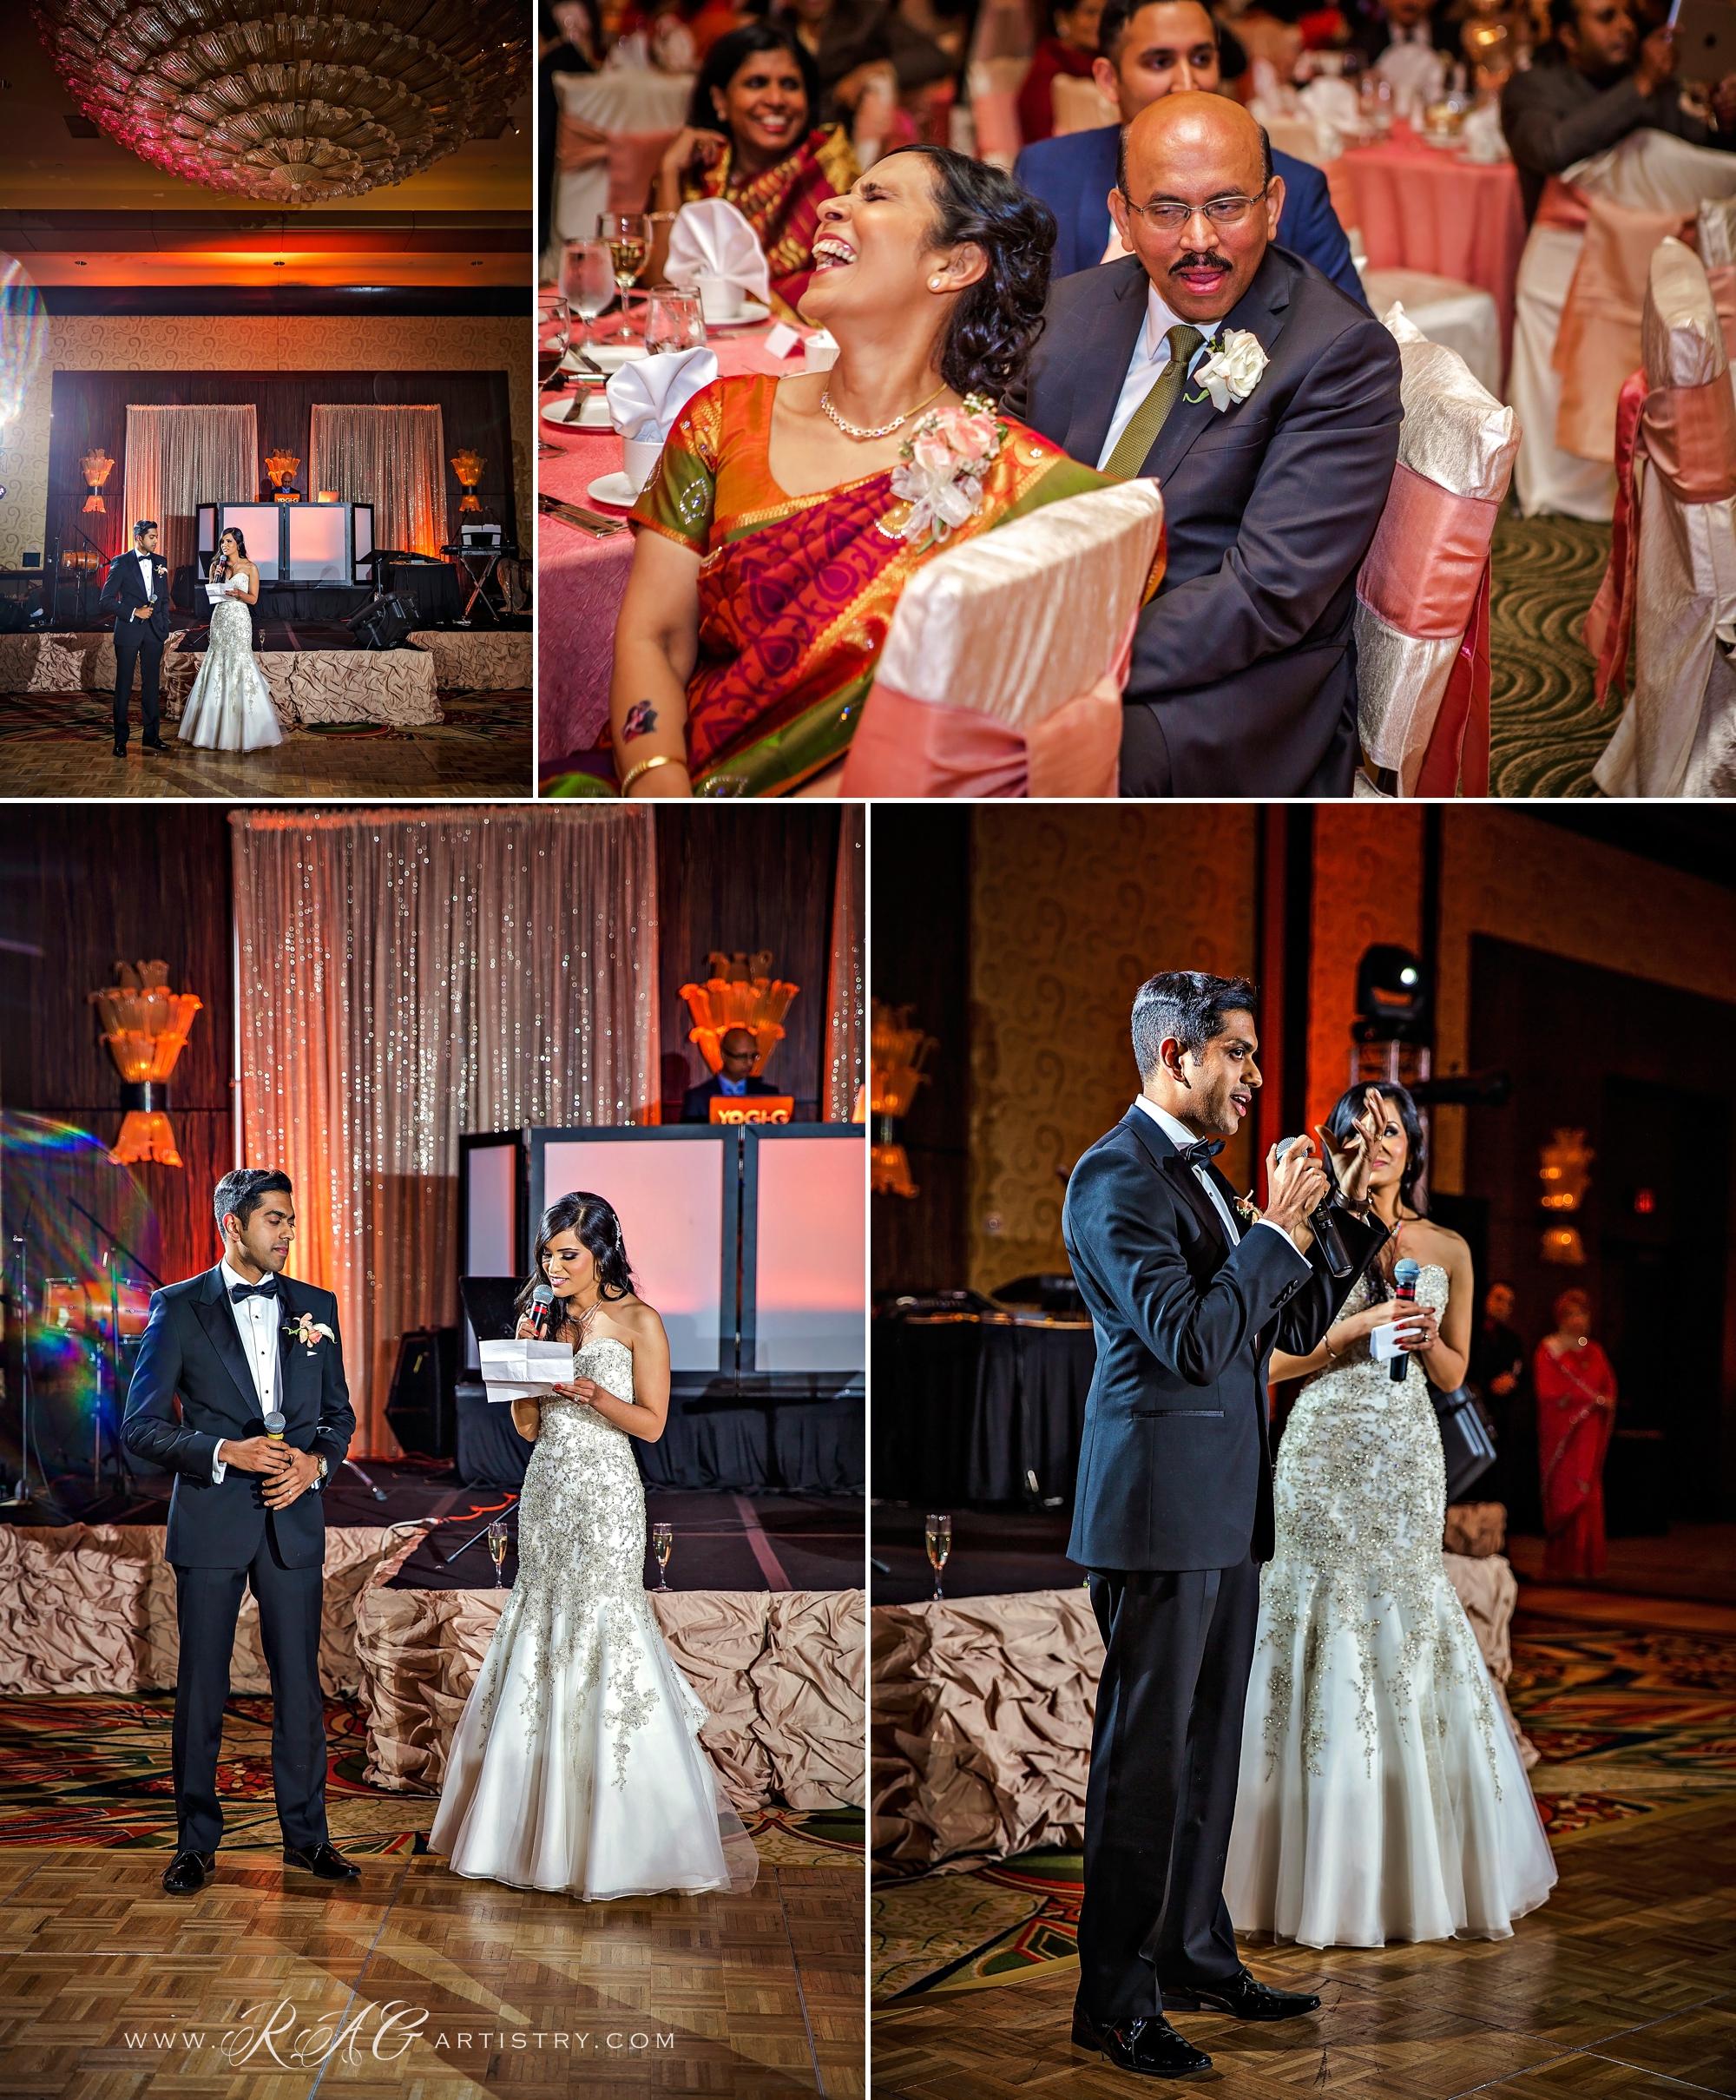 Houston Wedding Photographers: Tina + Danny :: Destination Wedding :: Houston Wedding